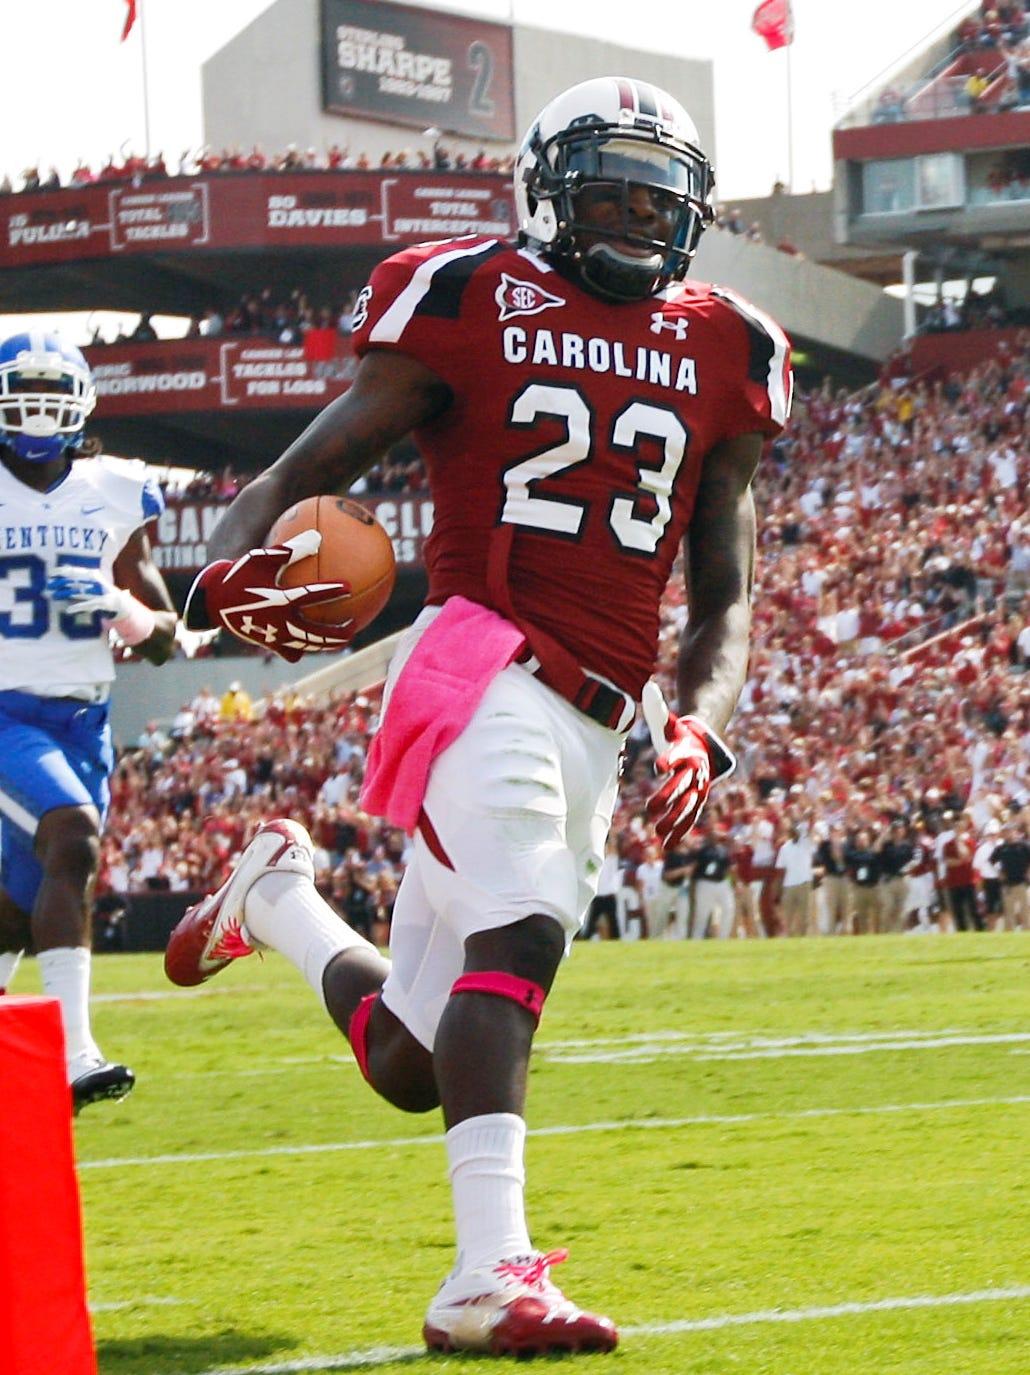 South Carolina's Bruce Ellington is a rare two-sport athlete